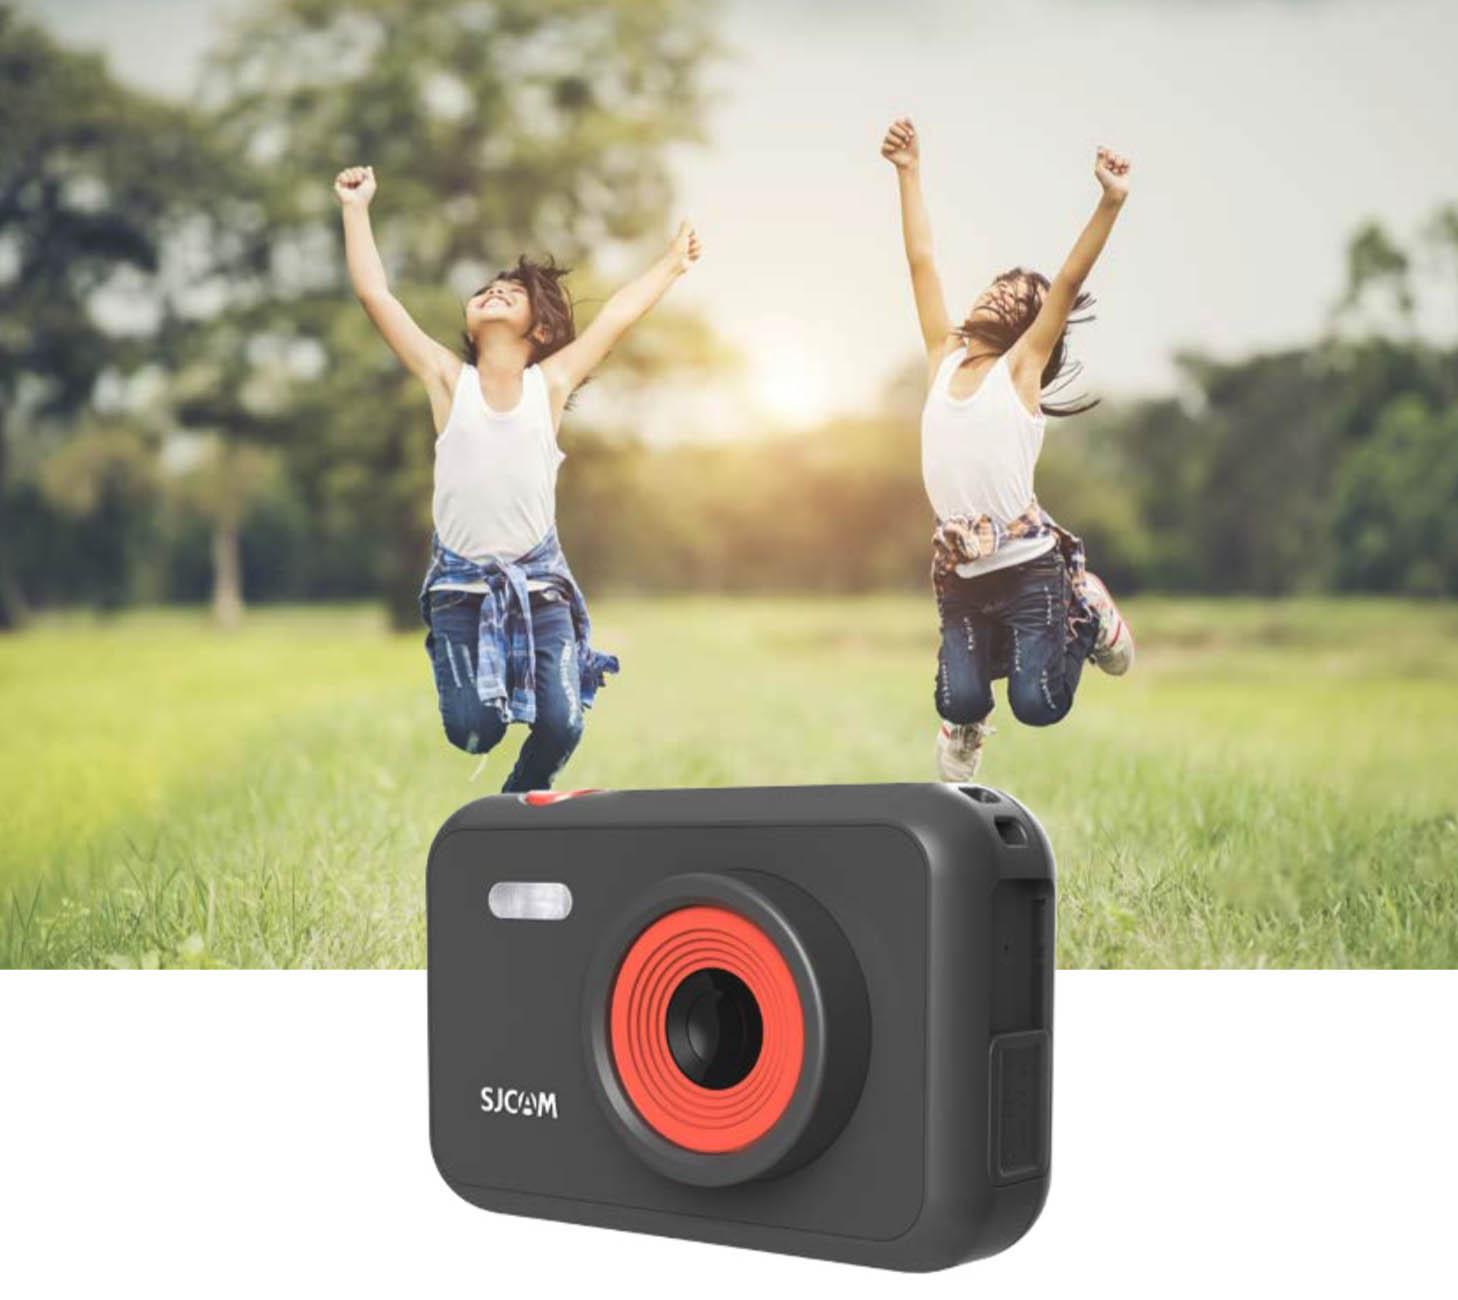 funcam-kids-hd-camera-features-5